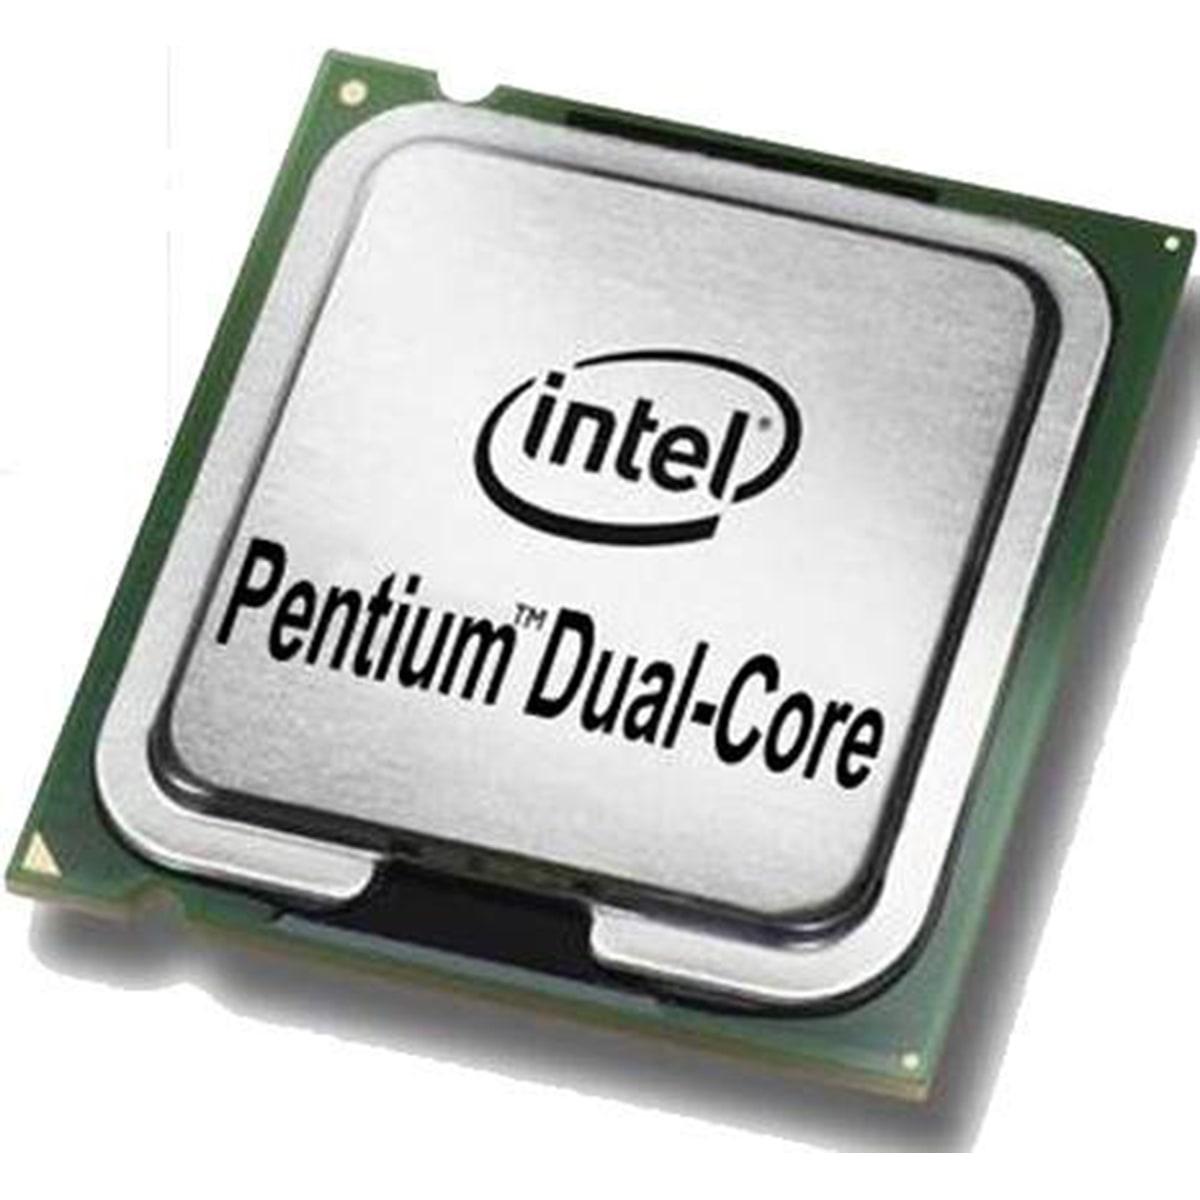 Processador Intel Dual Core E2160 1,80Ghz 1M Cache 800 MHz Socket 775 - Seminovo